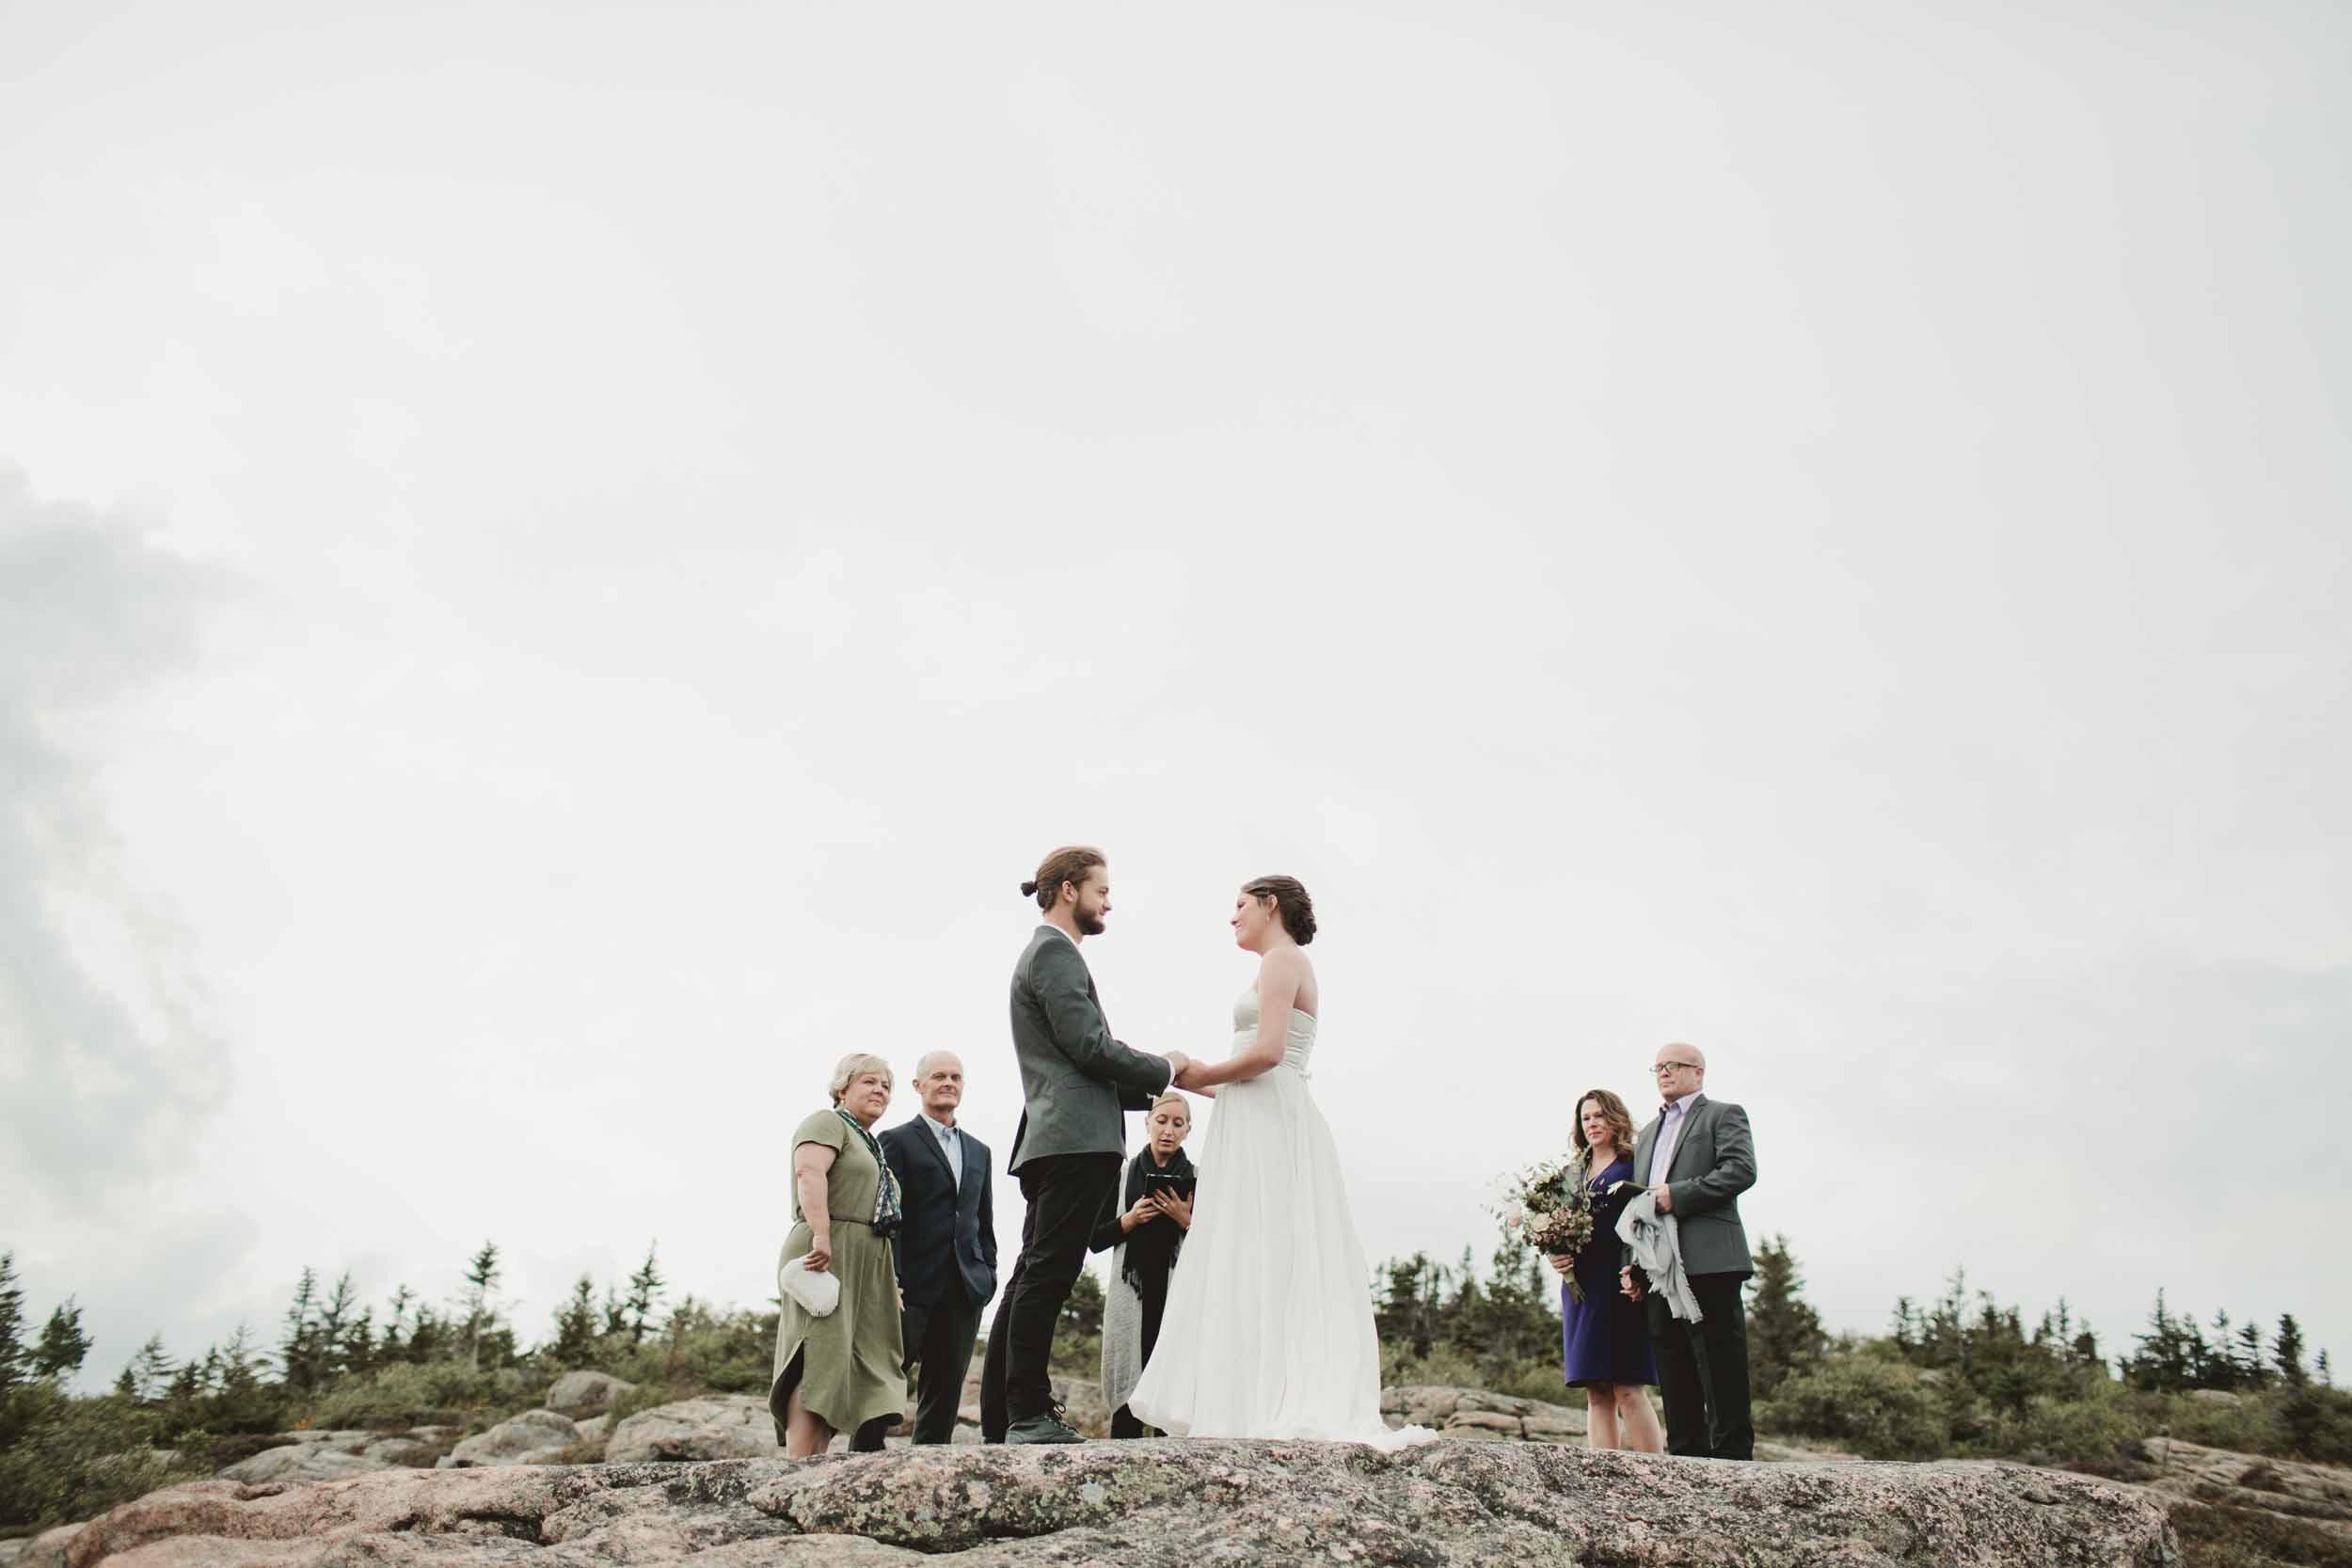 Maine-Elopement-Photographer59.jpg